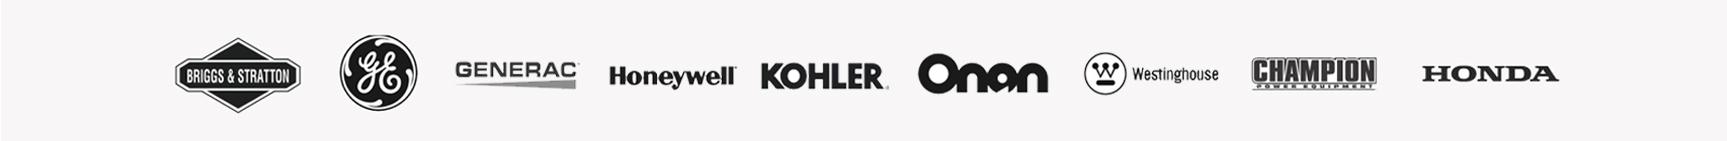 Brands We Trust: Briggs & Stratton, GE, Generac, Honeywell, Kohler, Onan, Westinghouse, Champion, Honda, and more